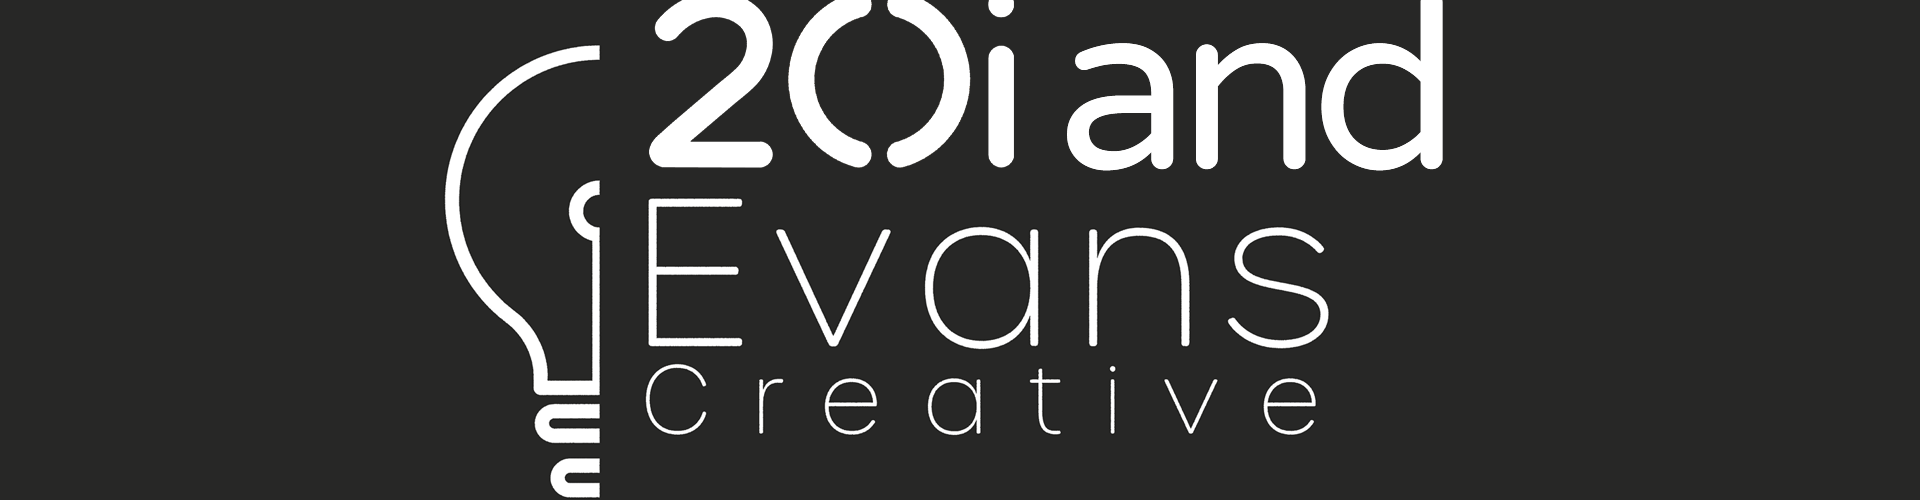 20i and Evans Creative logos